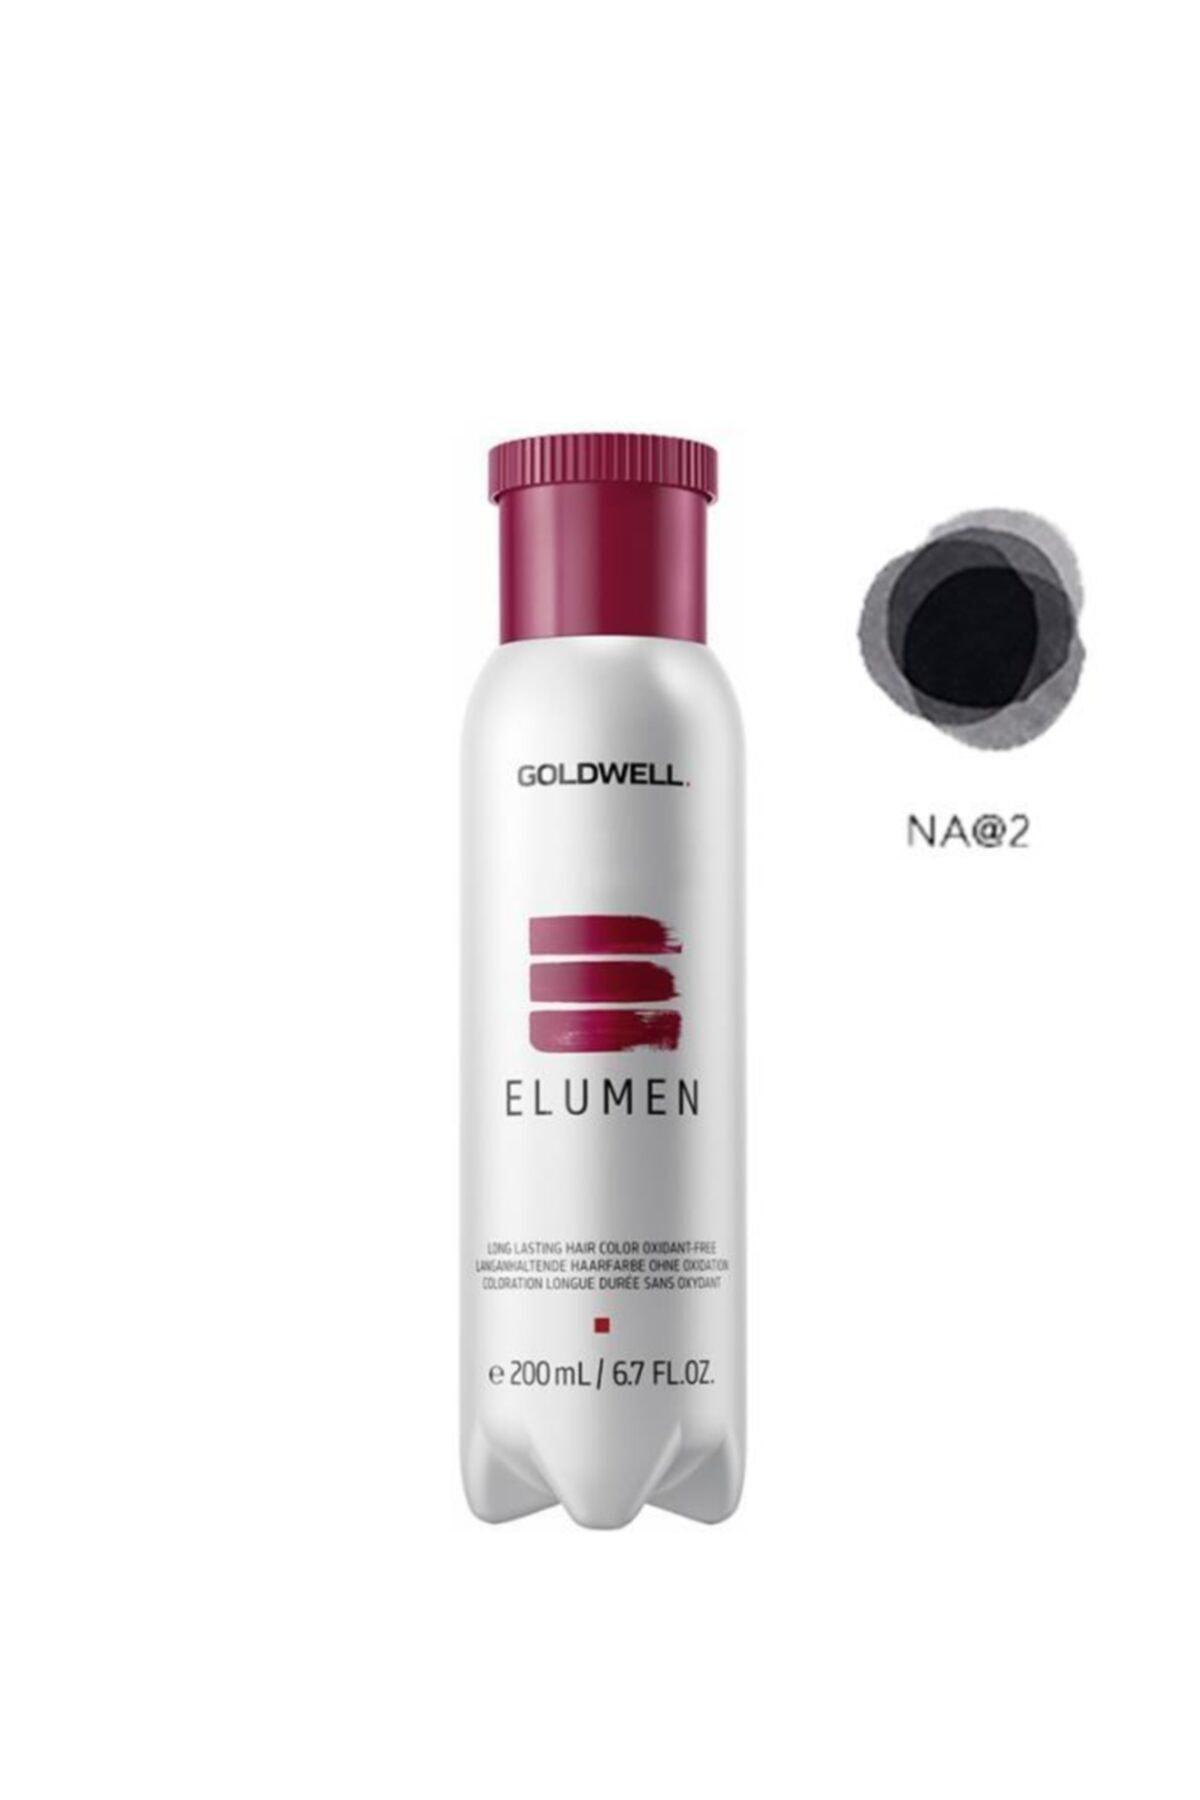 GOLDWELL Elumen Saç Boyası Na@2 Doğal Küllü Siyah 200 ml 1